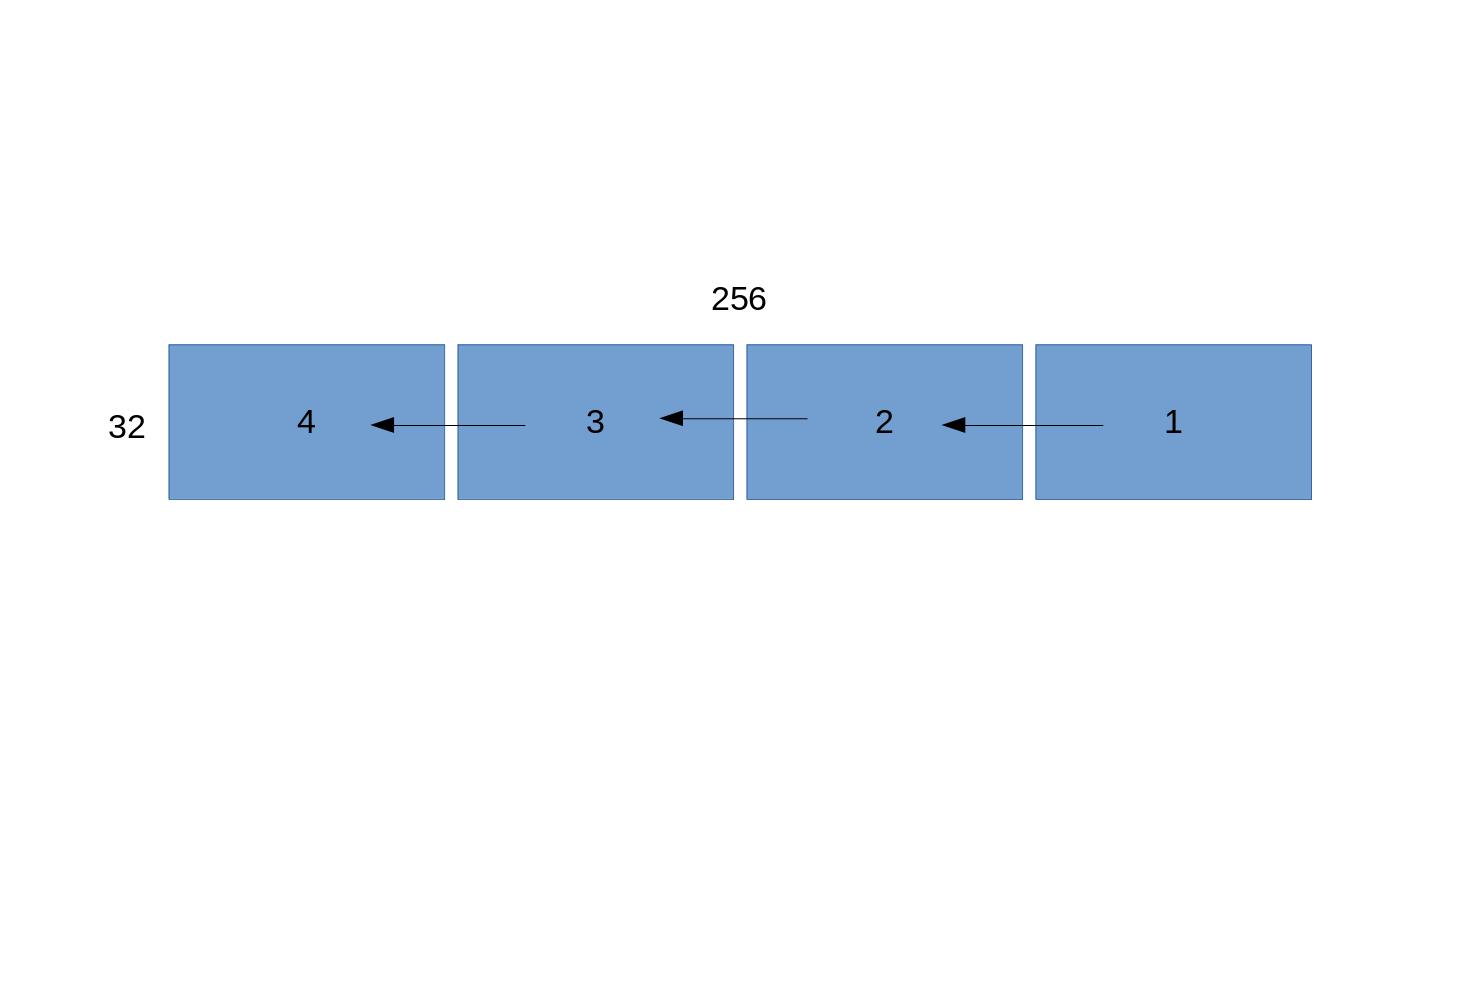 led_matrices_ksnip_20210128-111752.png